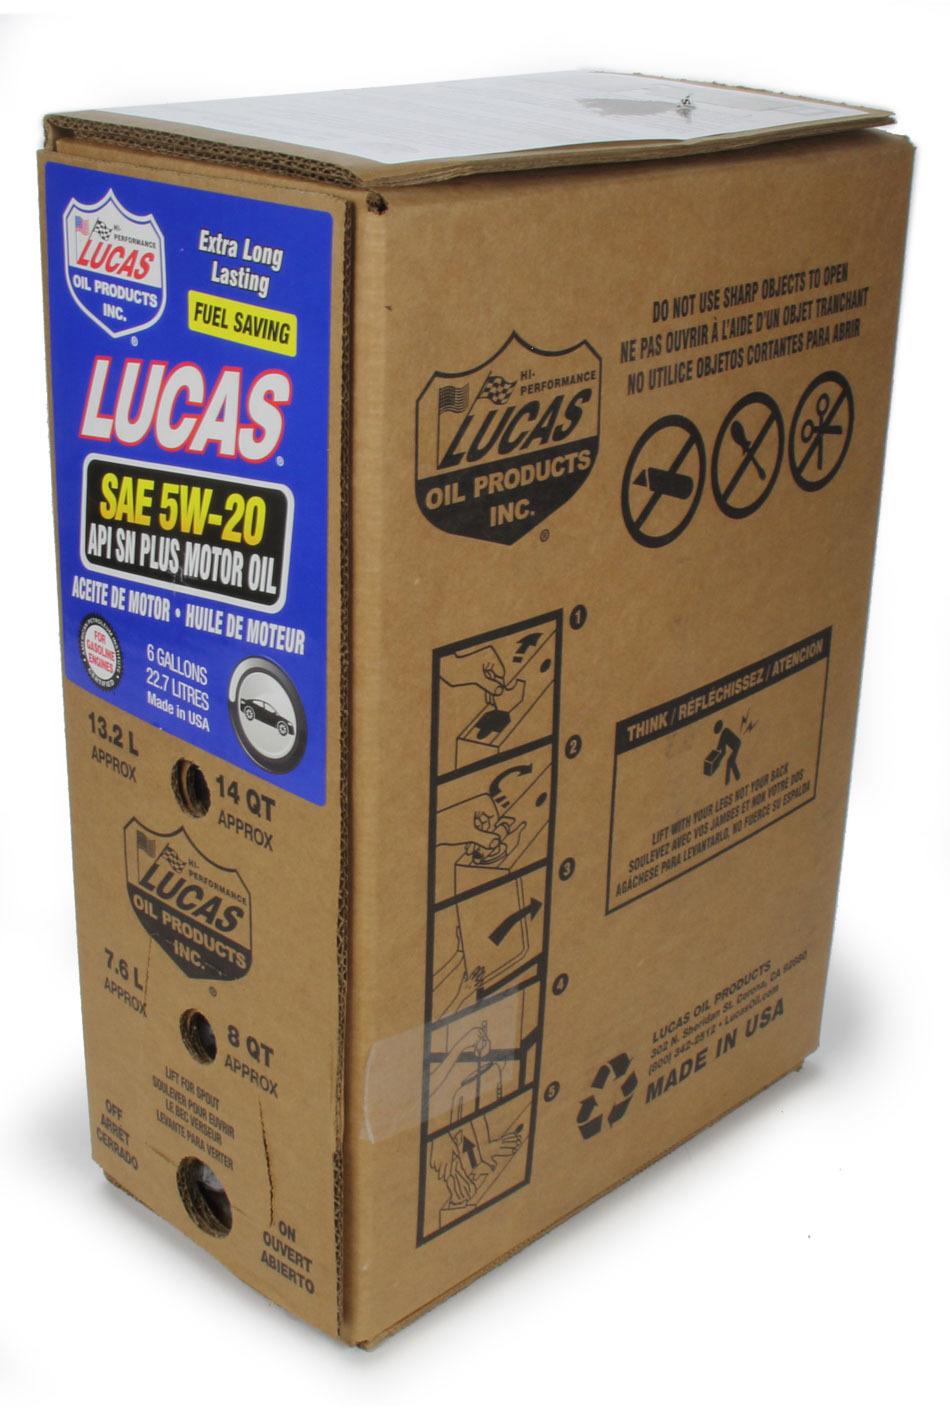 SAE 5W20 Motor Oil 6 Gallon Bag In Box